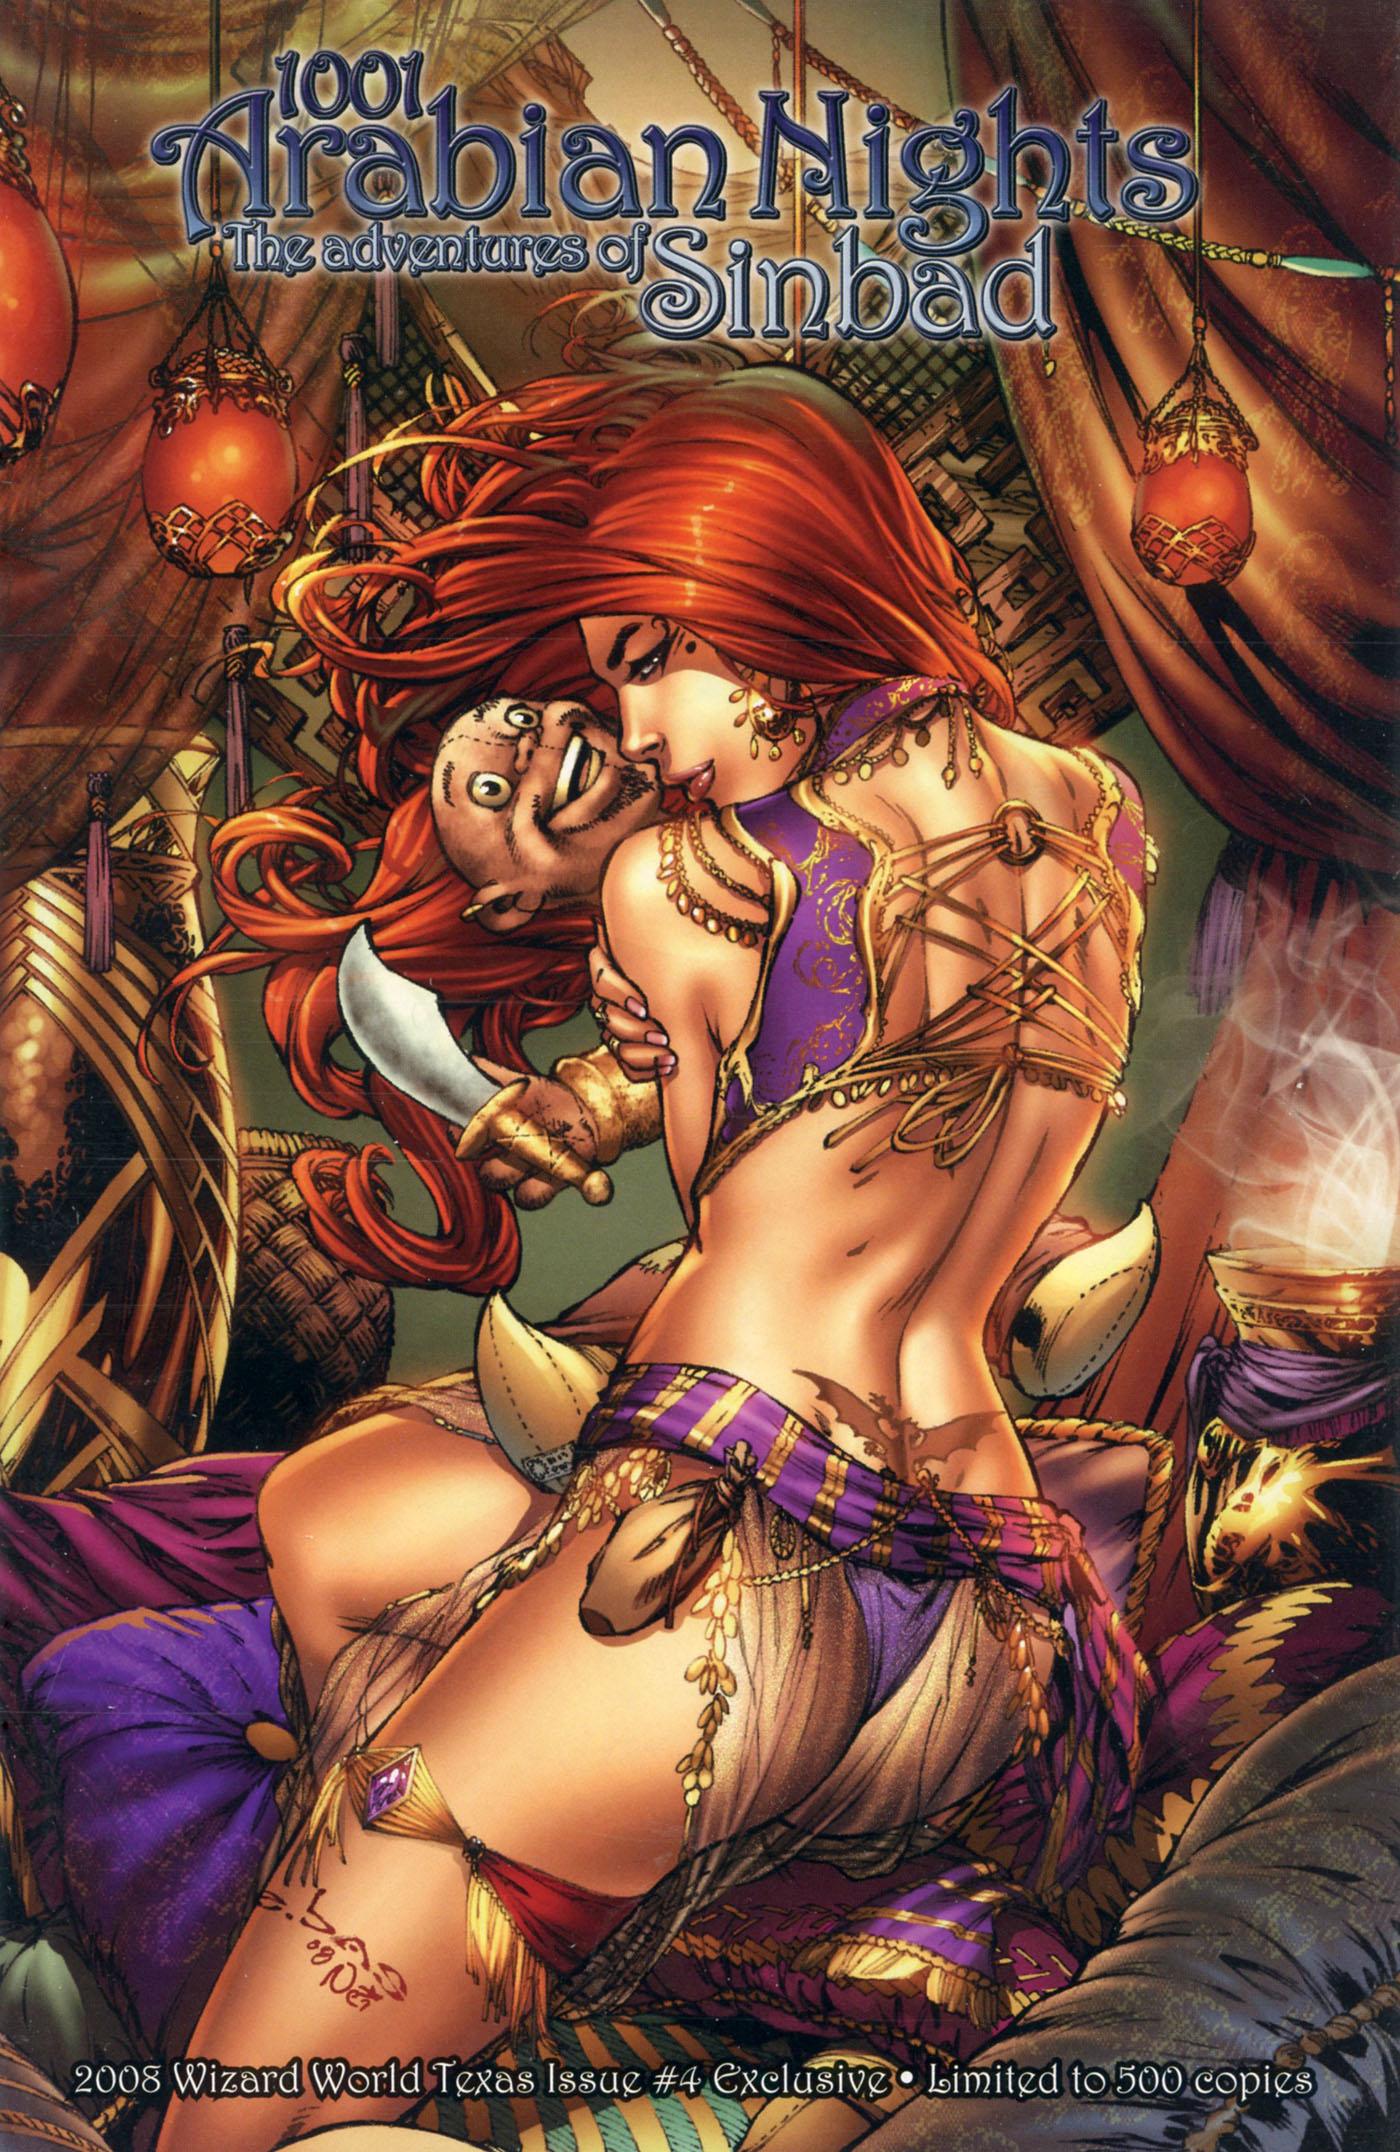 Read online 1001 Arabian Nights: The Adventures of Sinbad comic -  Issue #4 - 3